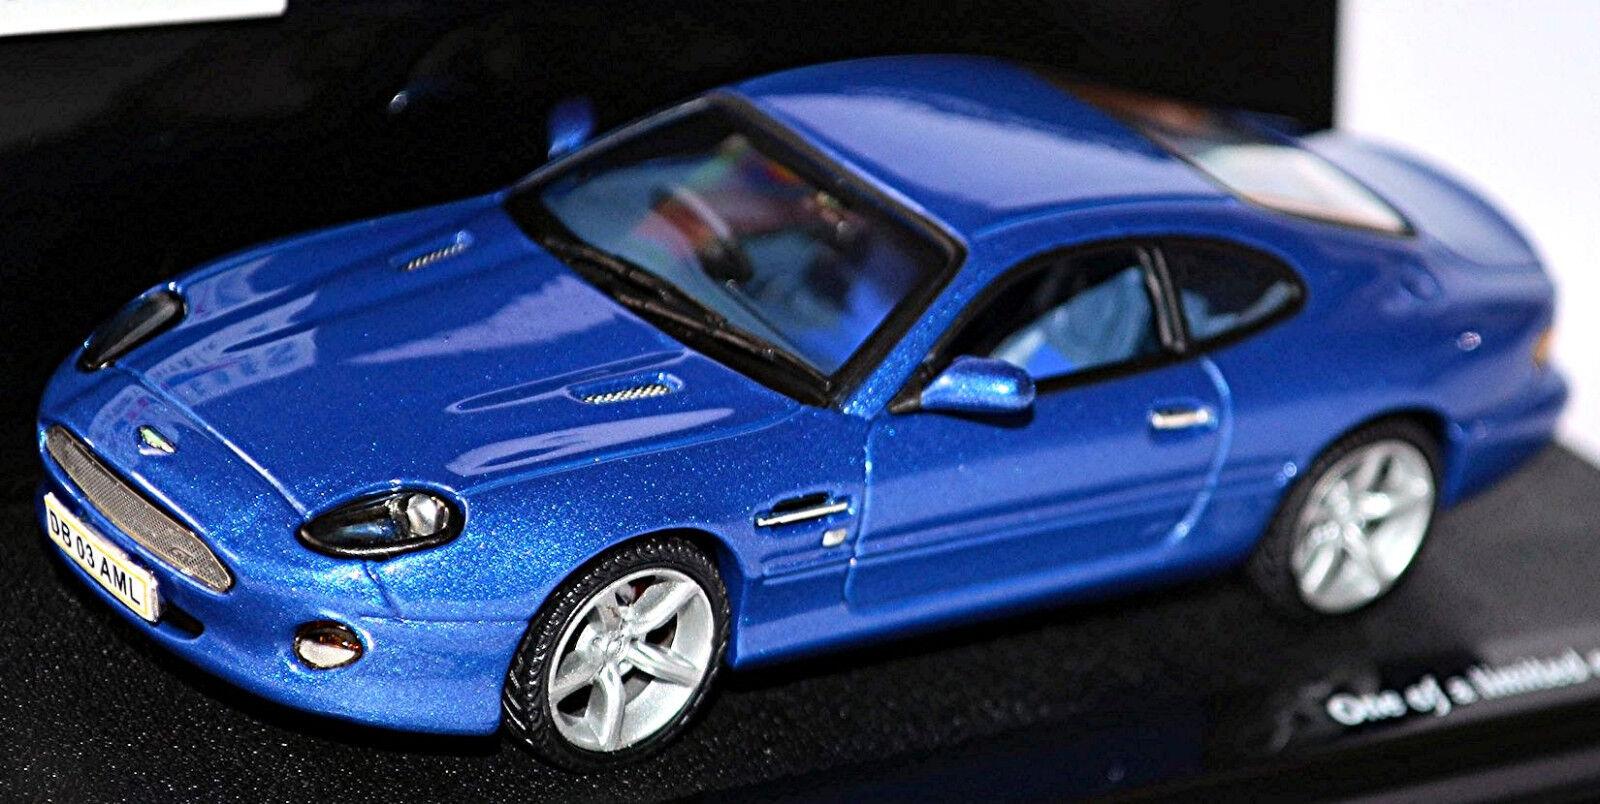 Aston Martin DB7 Gt Coupe 2002-03 greenigo bluee Metallic 1 43 Vitesse